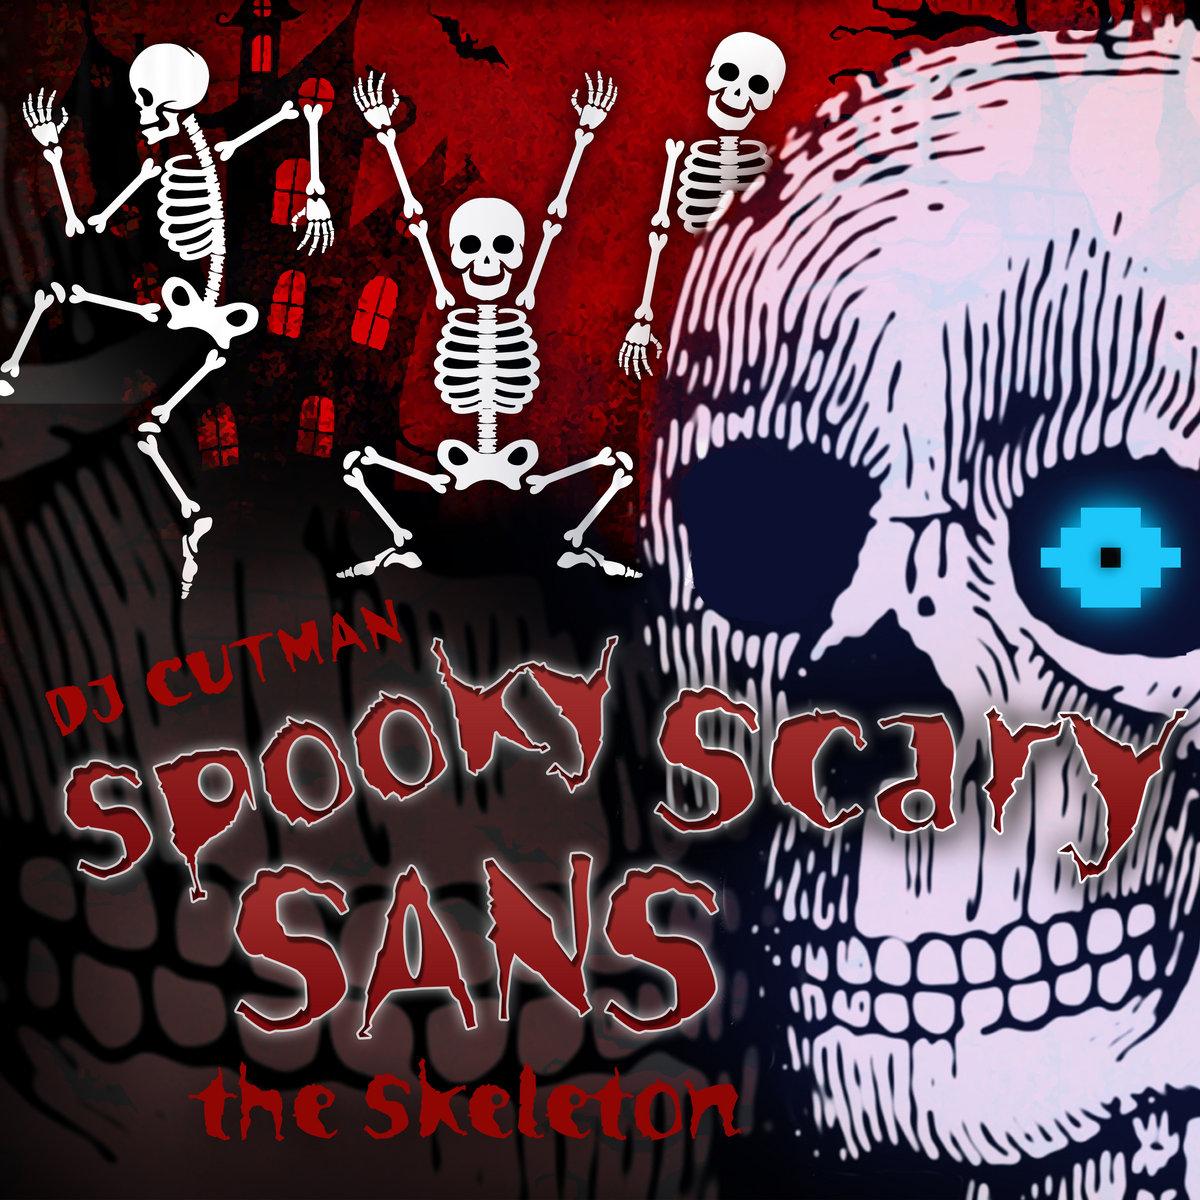 Spooky Scary Sans the Skeleton   Dj CUTMAN